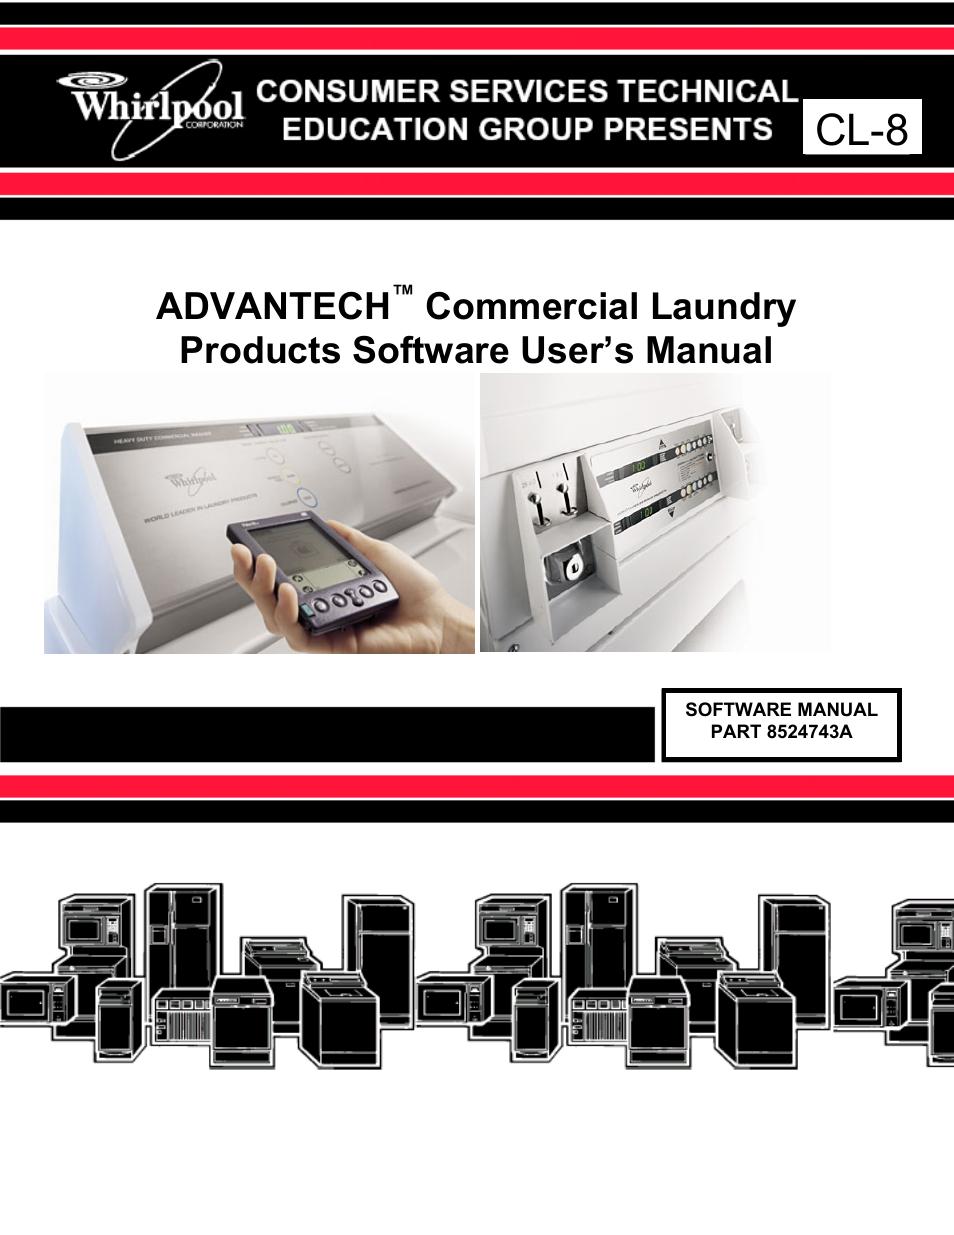 whirlpool advantech cl 8 user manual 108 pages rh manualsdir com visonic cl-8 user manual cl-8 manual